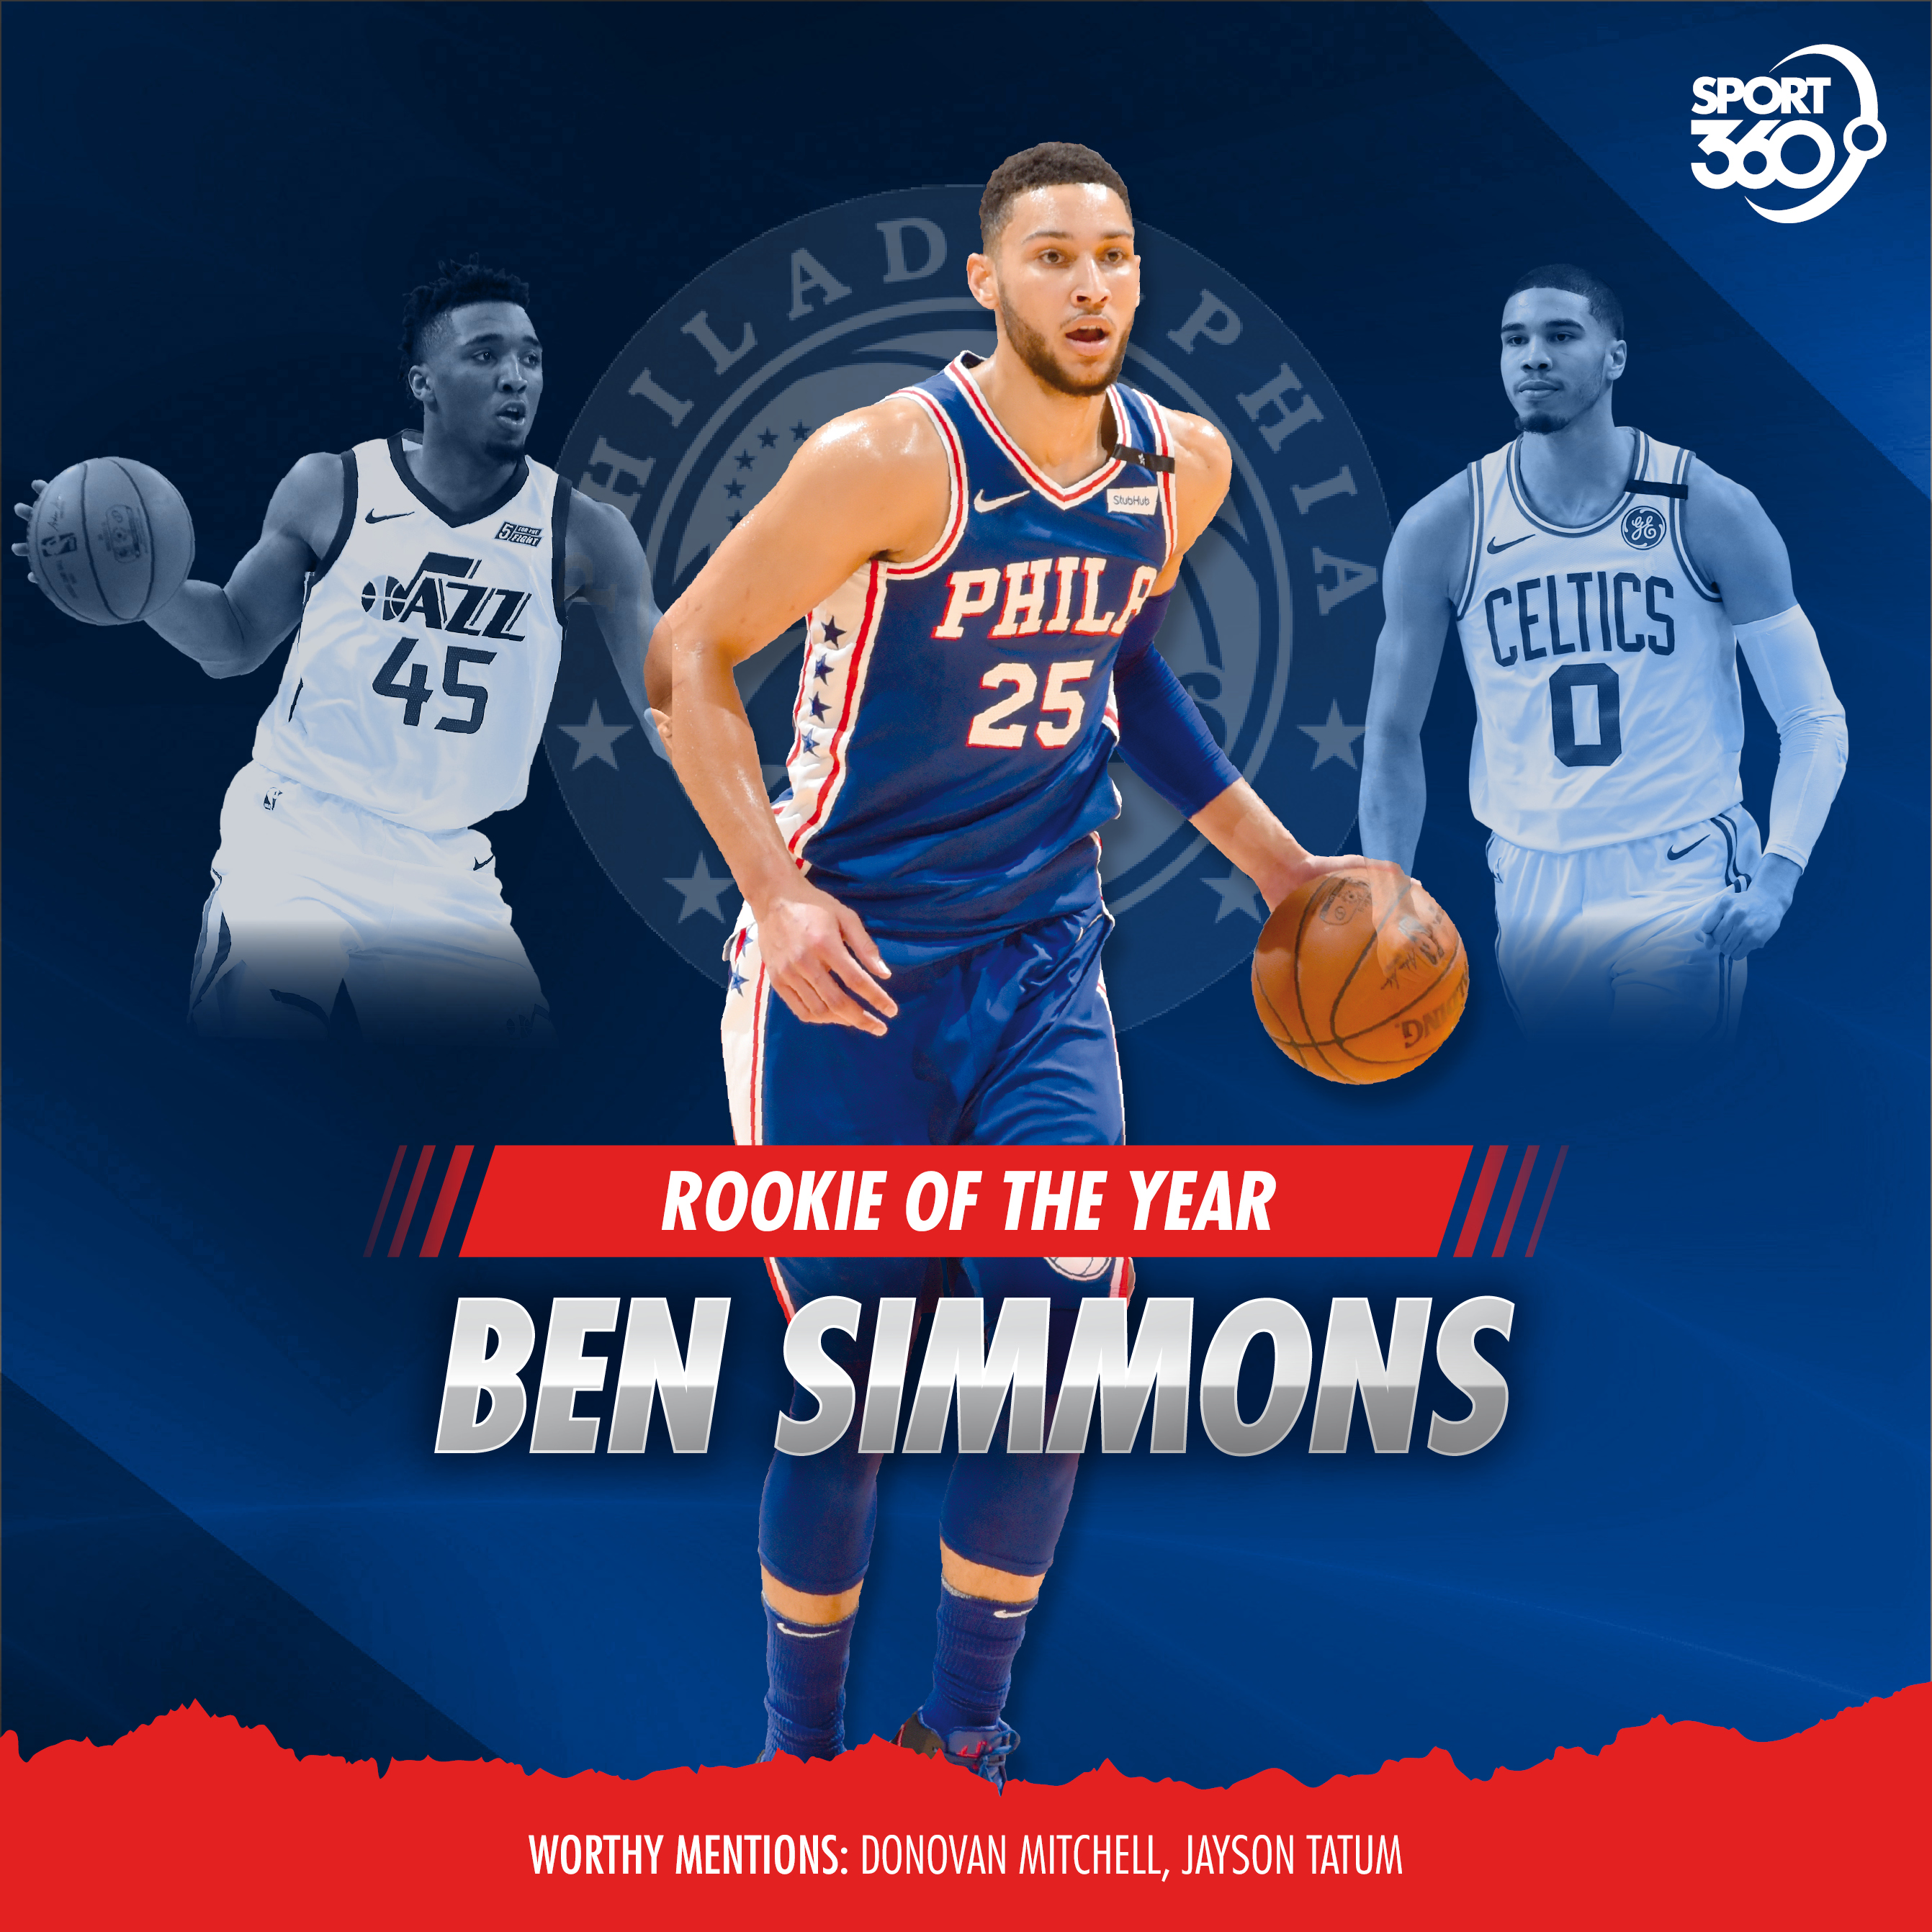 11 06 2018 NBA rookie-simmons